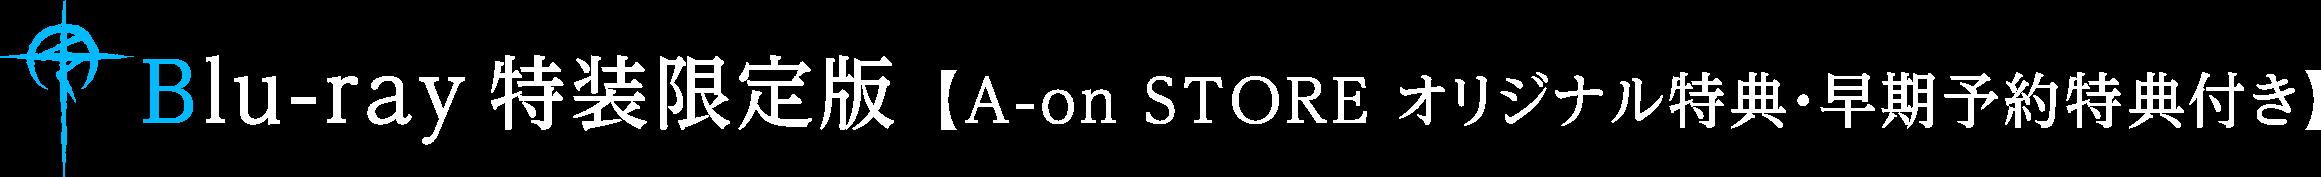 Blu-ray特装限定版【A-on STORE オリジナル特典・早期予約特典付き】